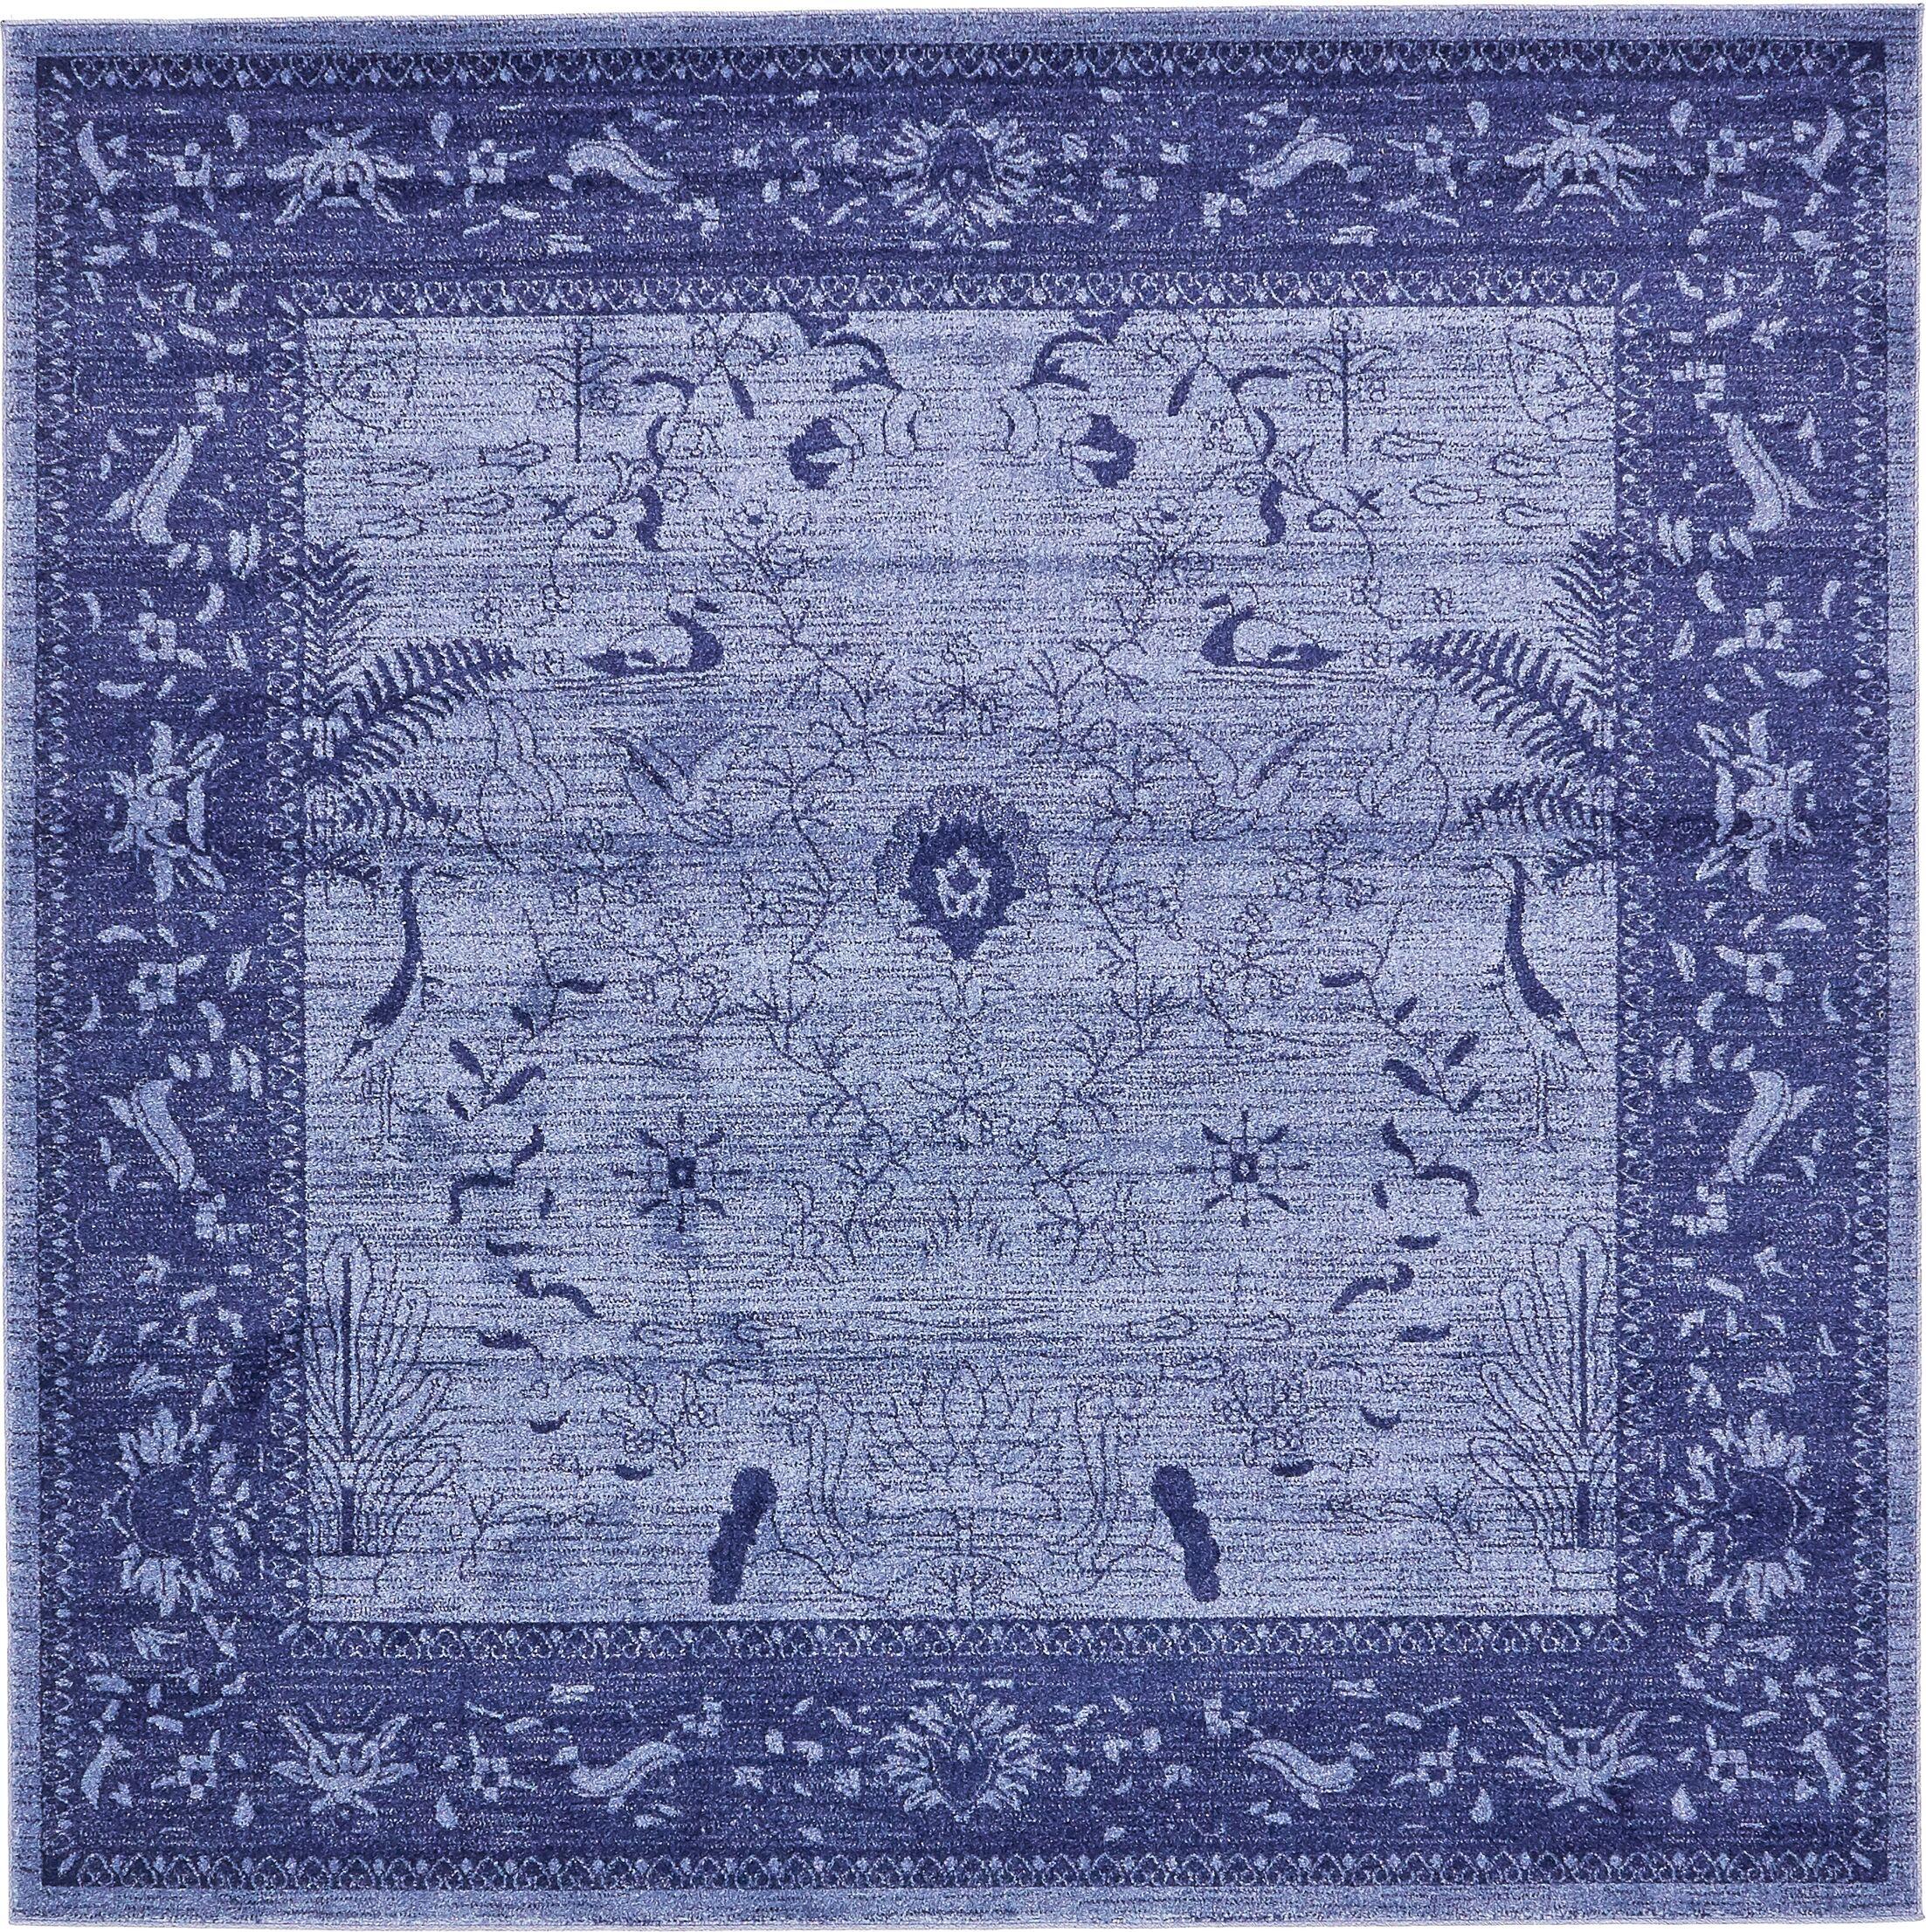 Shailene Blue Area Rug Rug Size: Square 8'